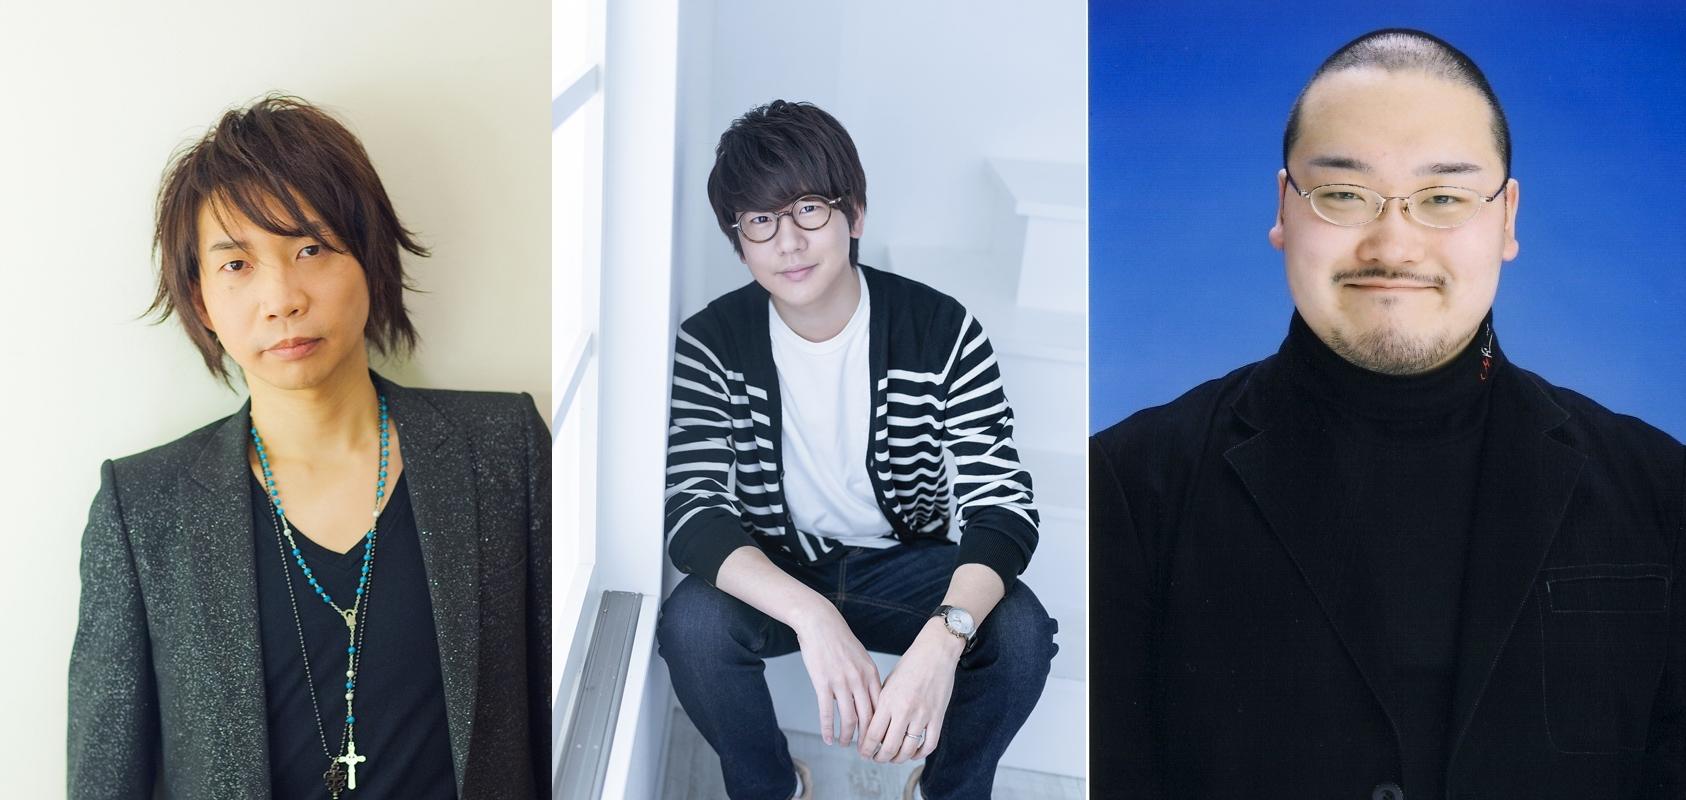 『Back Street Girls -ゴクドルズ-』に諏訪部順一、花江夏樹、間宮康弘が出演